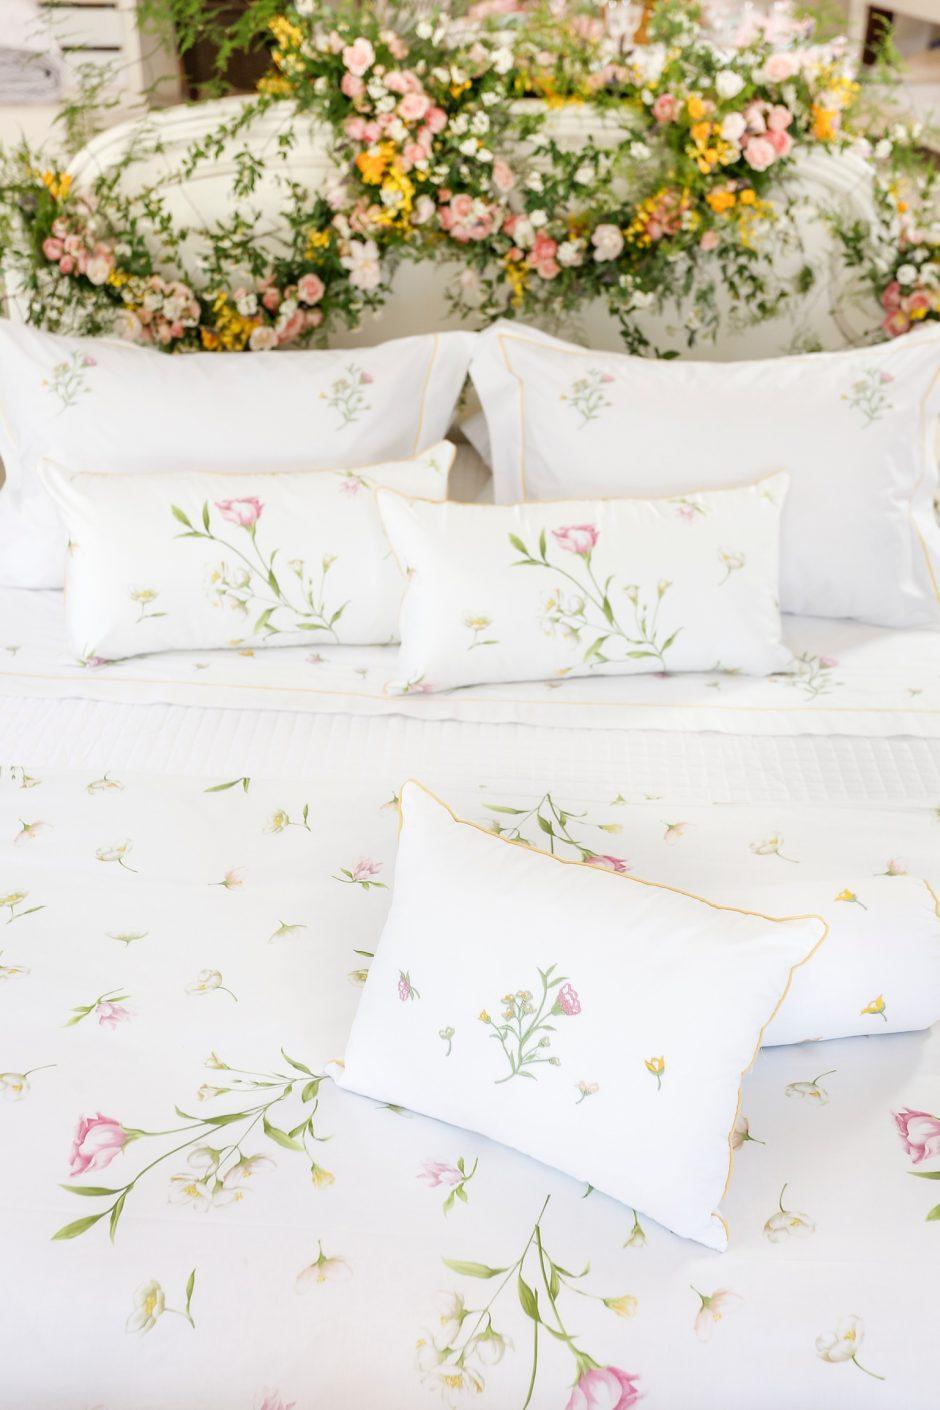 colecao de roupa de cama